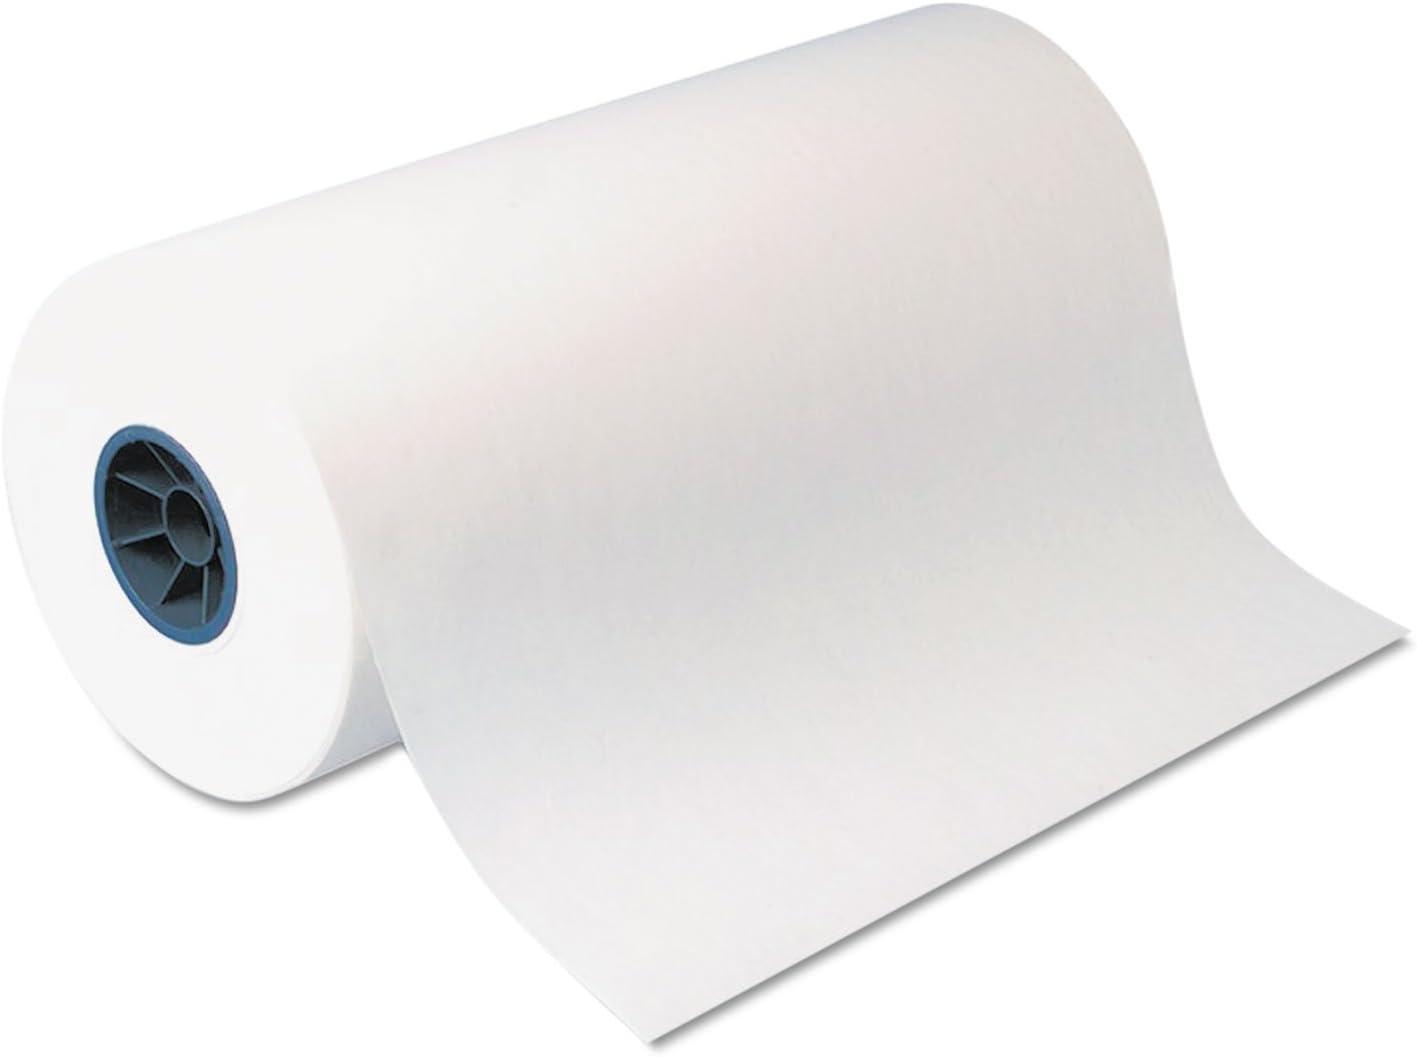 DXESUPLOX18 - Super Loxol Freezer Paper